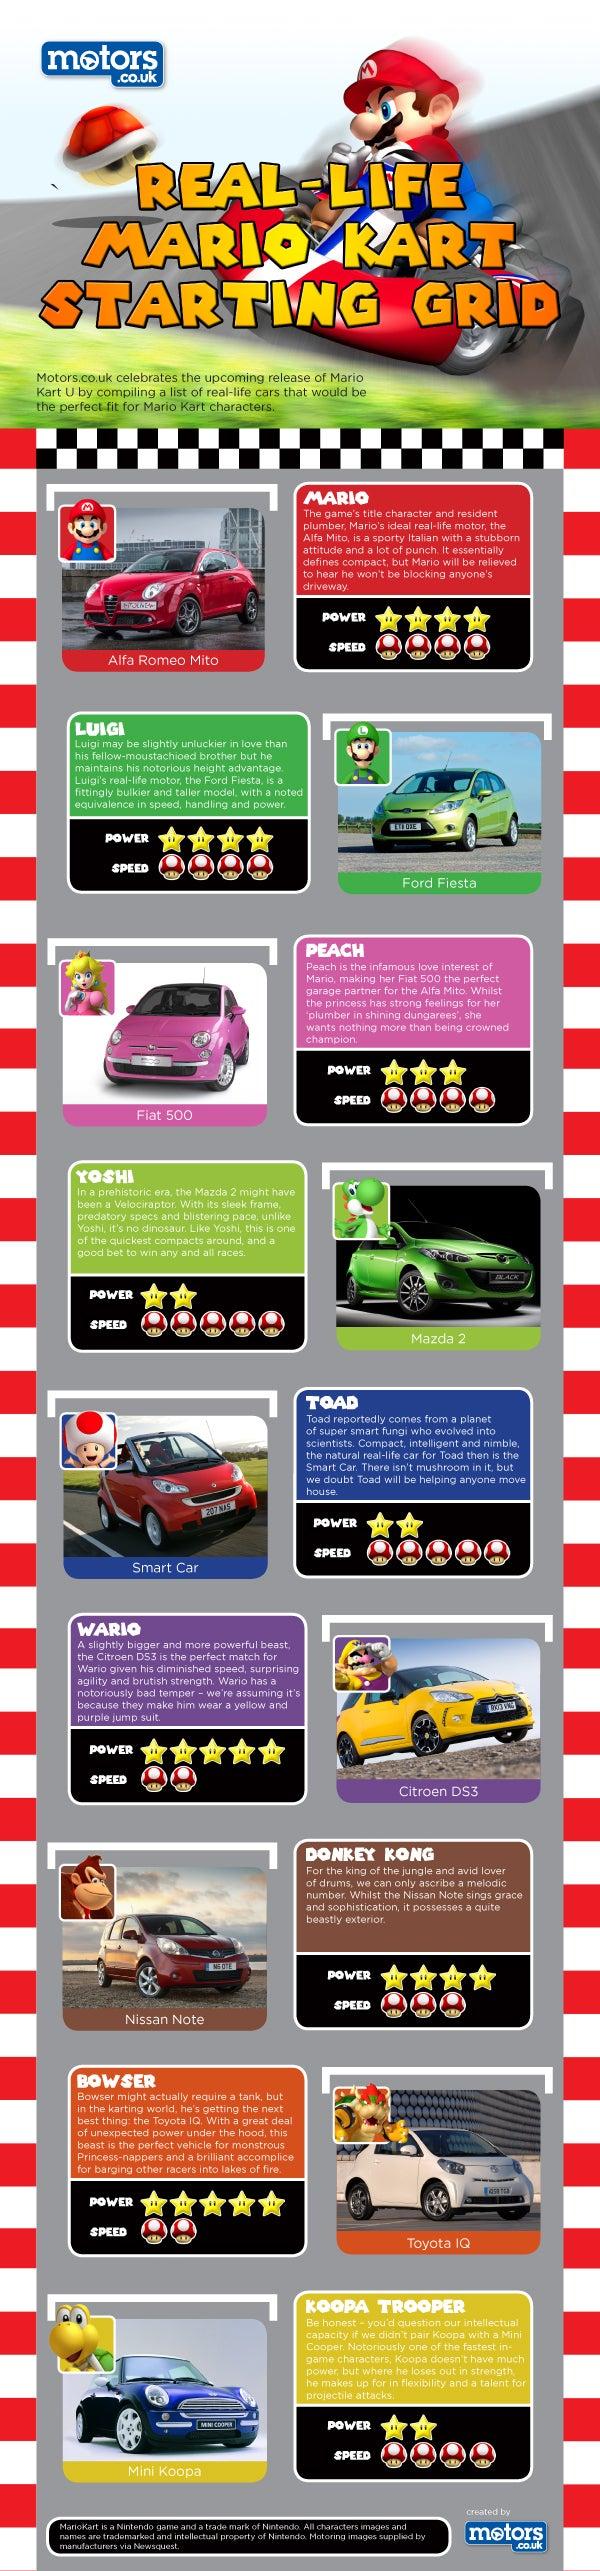 Real-Life Mario Kart Starting Grid